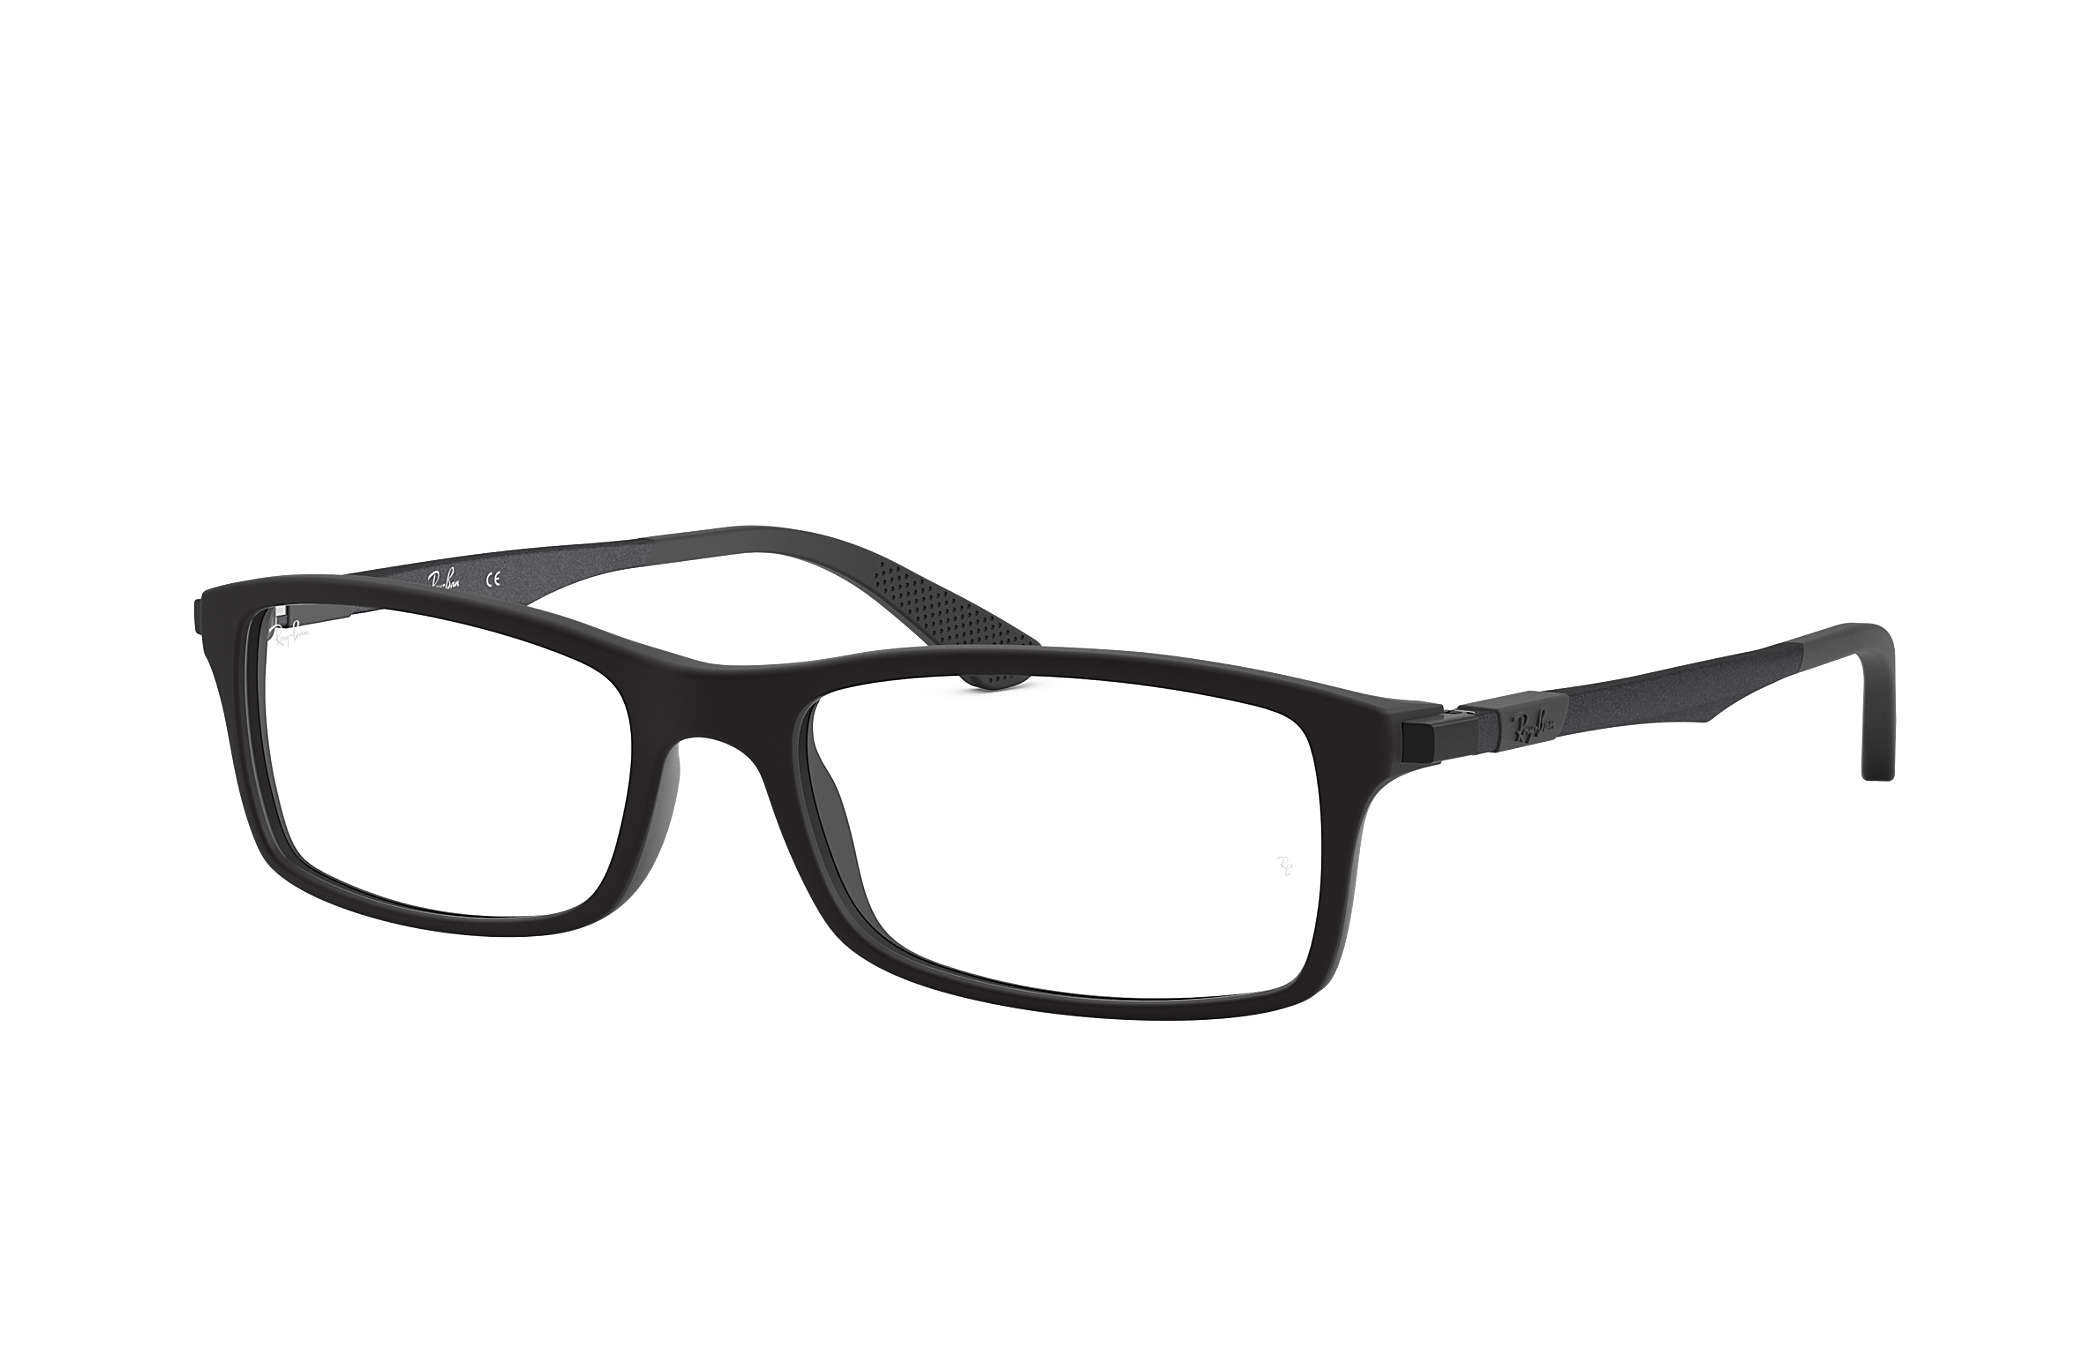 e3fd829d29f6b Ray-Ban prescription glasses RB7017 Black - Acetate - 0RX7017519652 ...